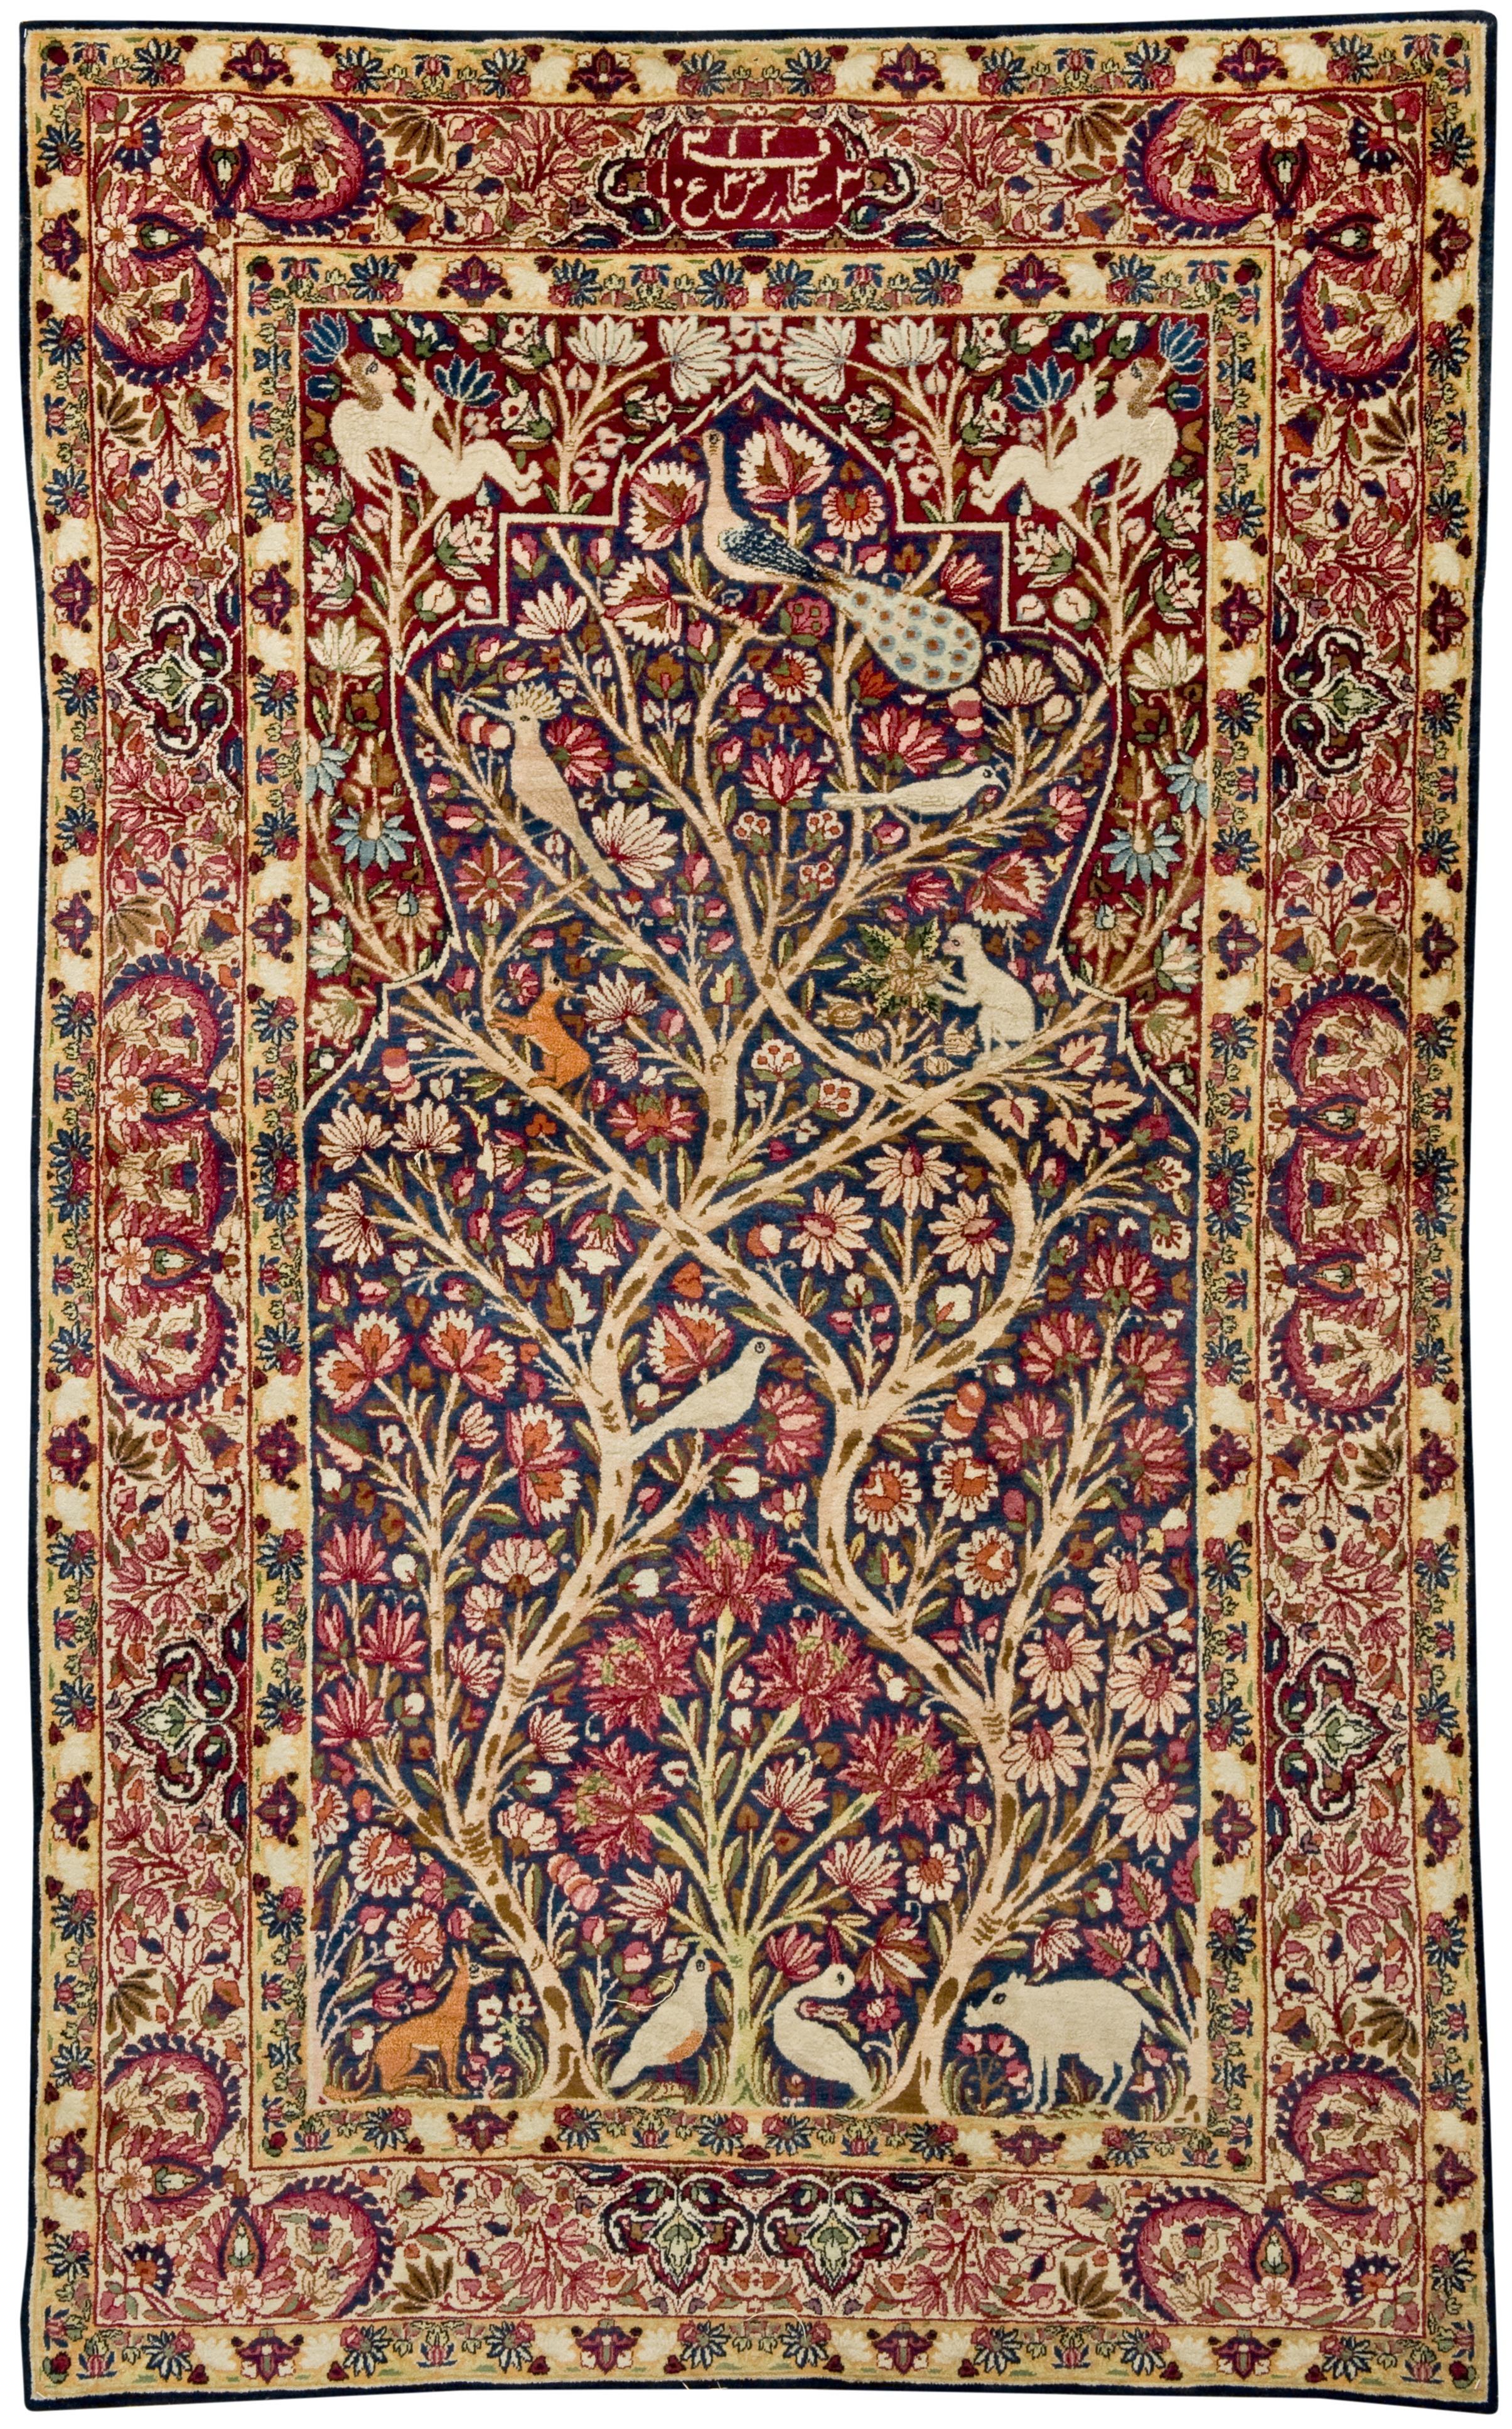 Tappeti Persiani Vintage: Tappeti vintage patchwork.